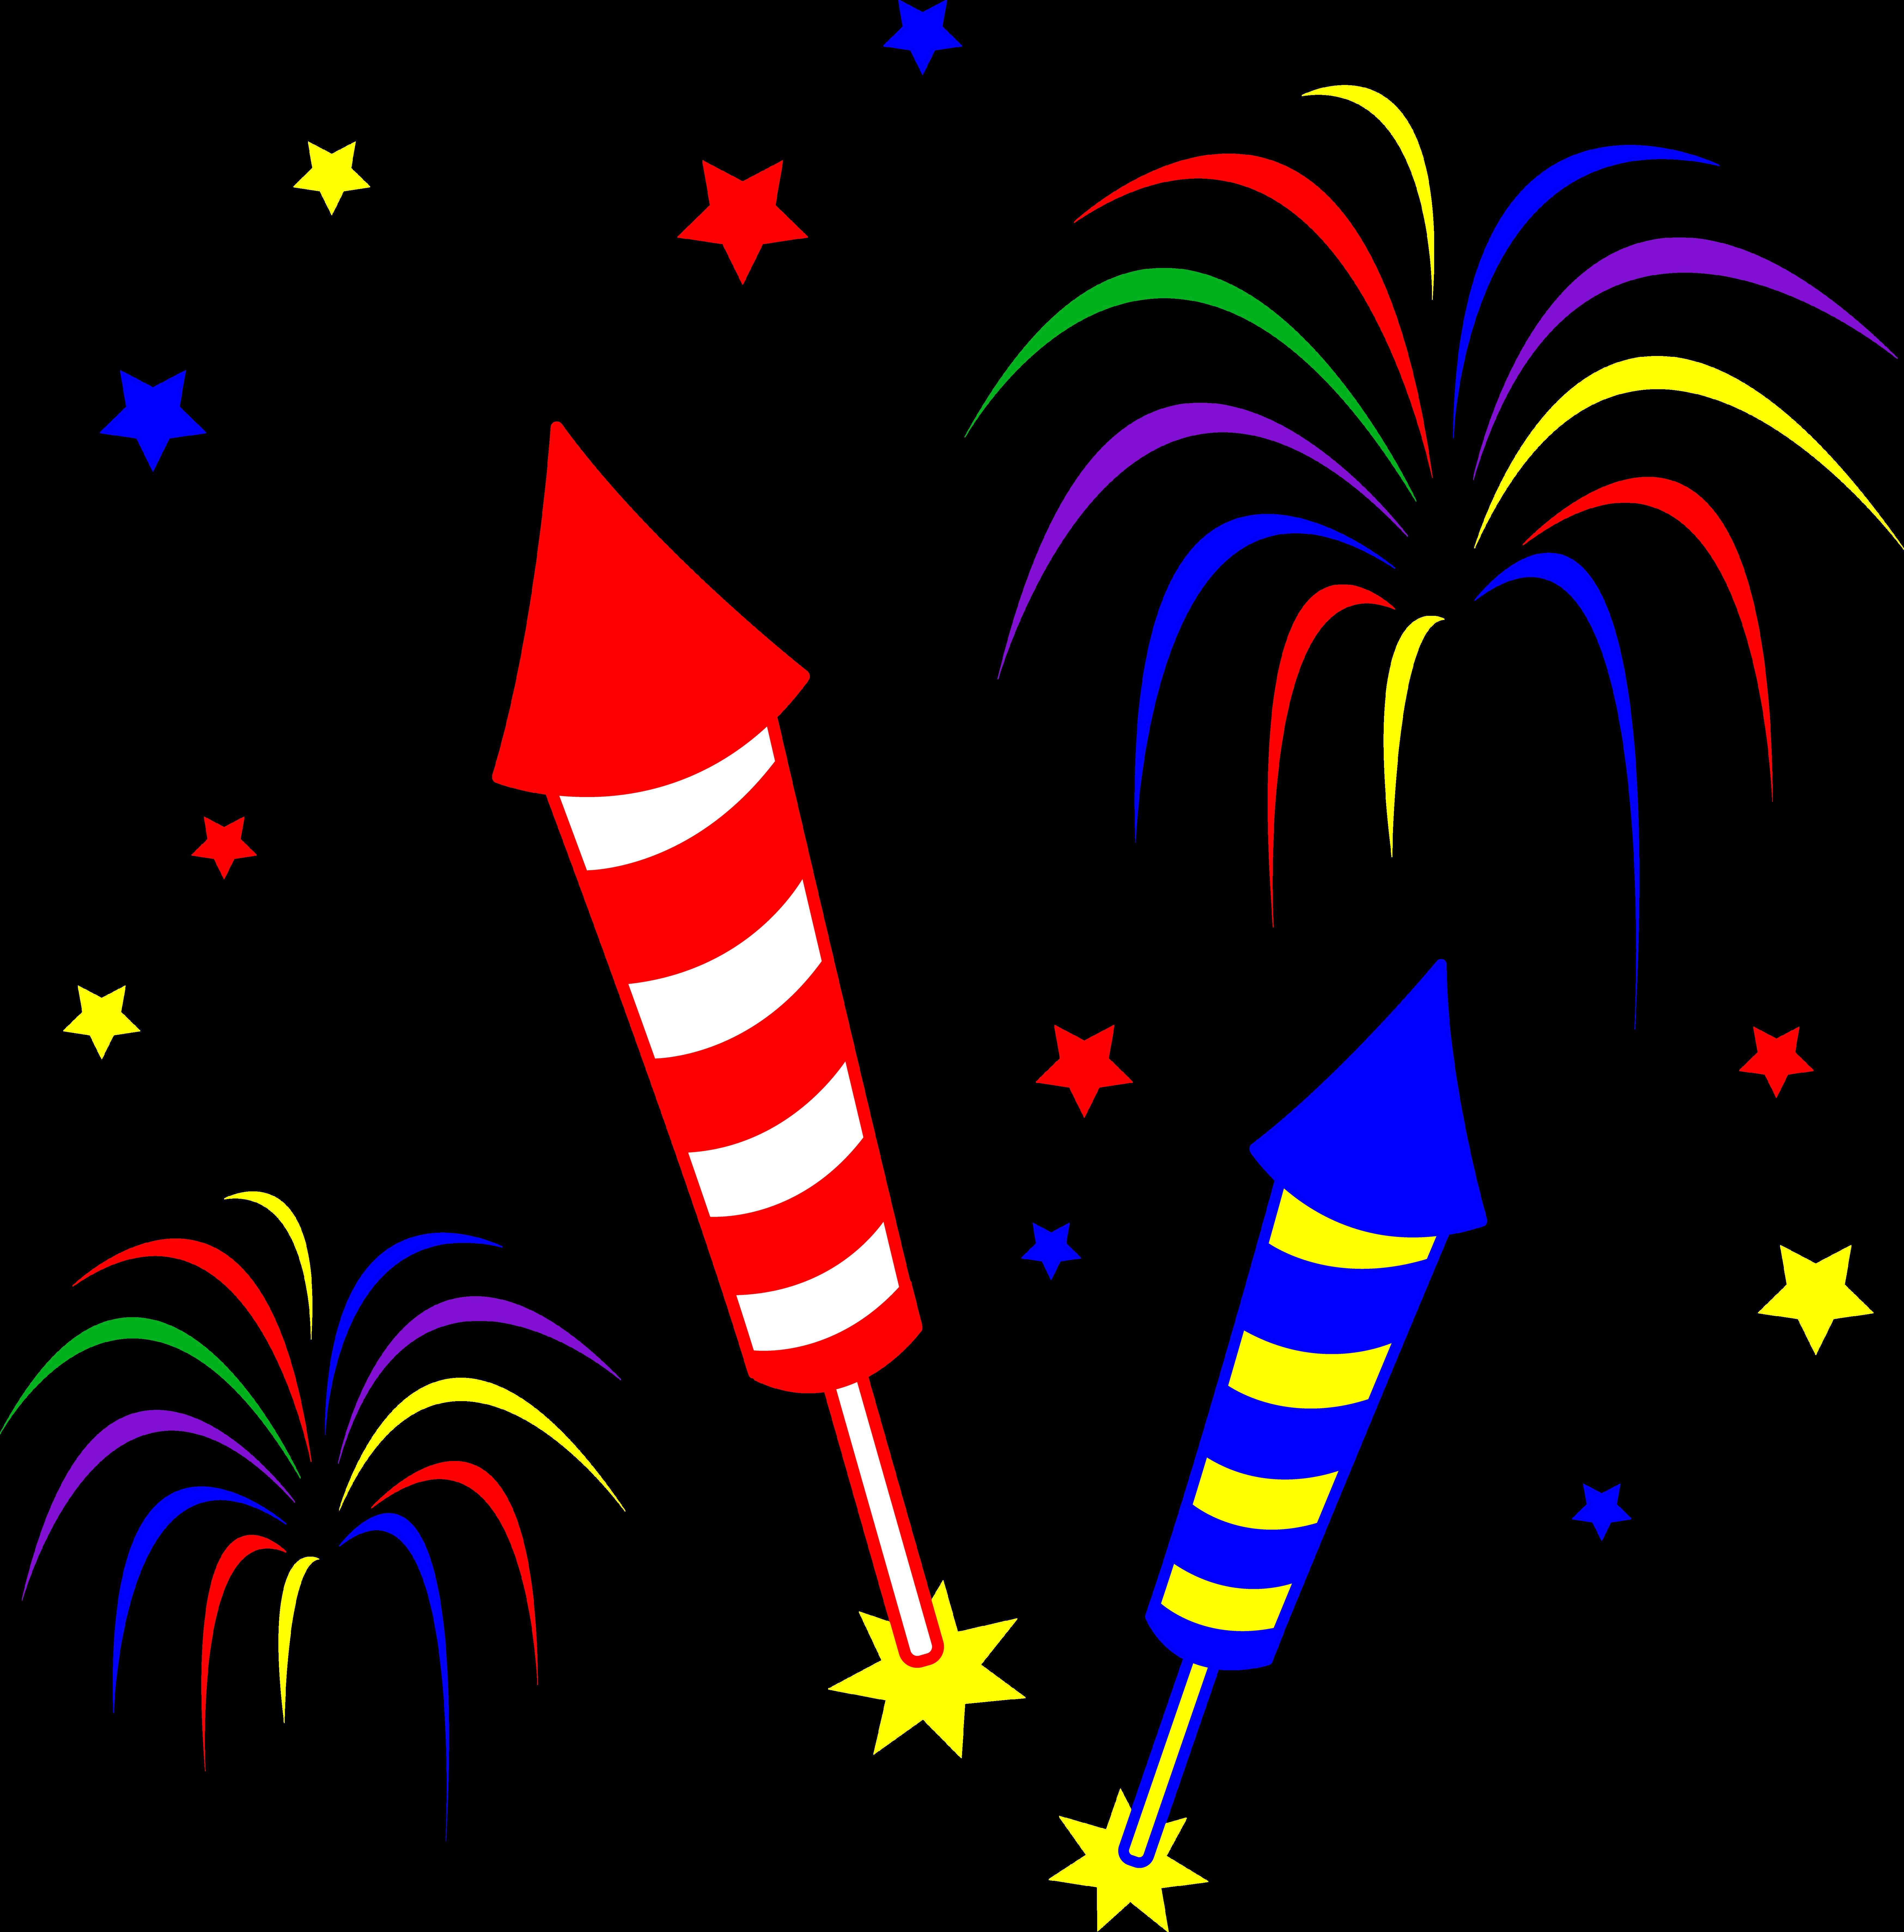 Cartoon Fireworks Clip Art Free Courseim-Cartoon Fireworks Clip Art Free Courseimage-2